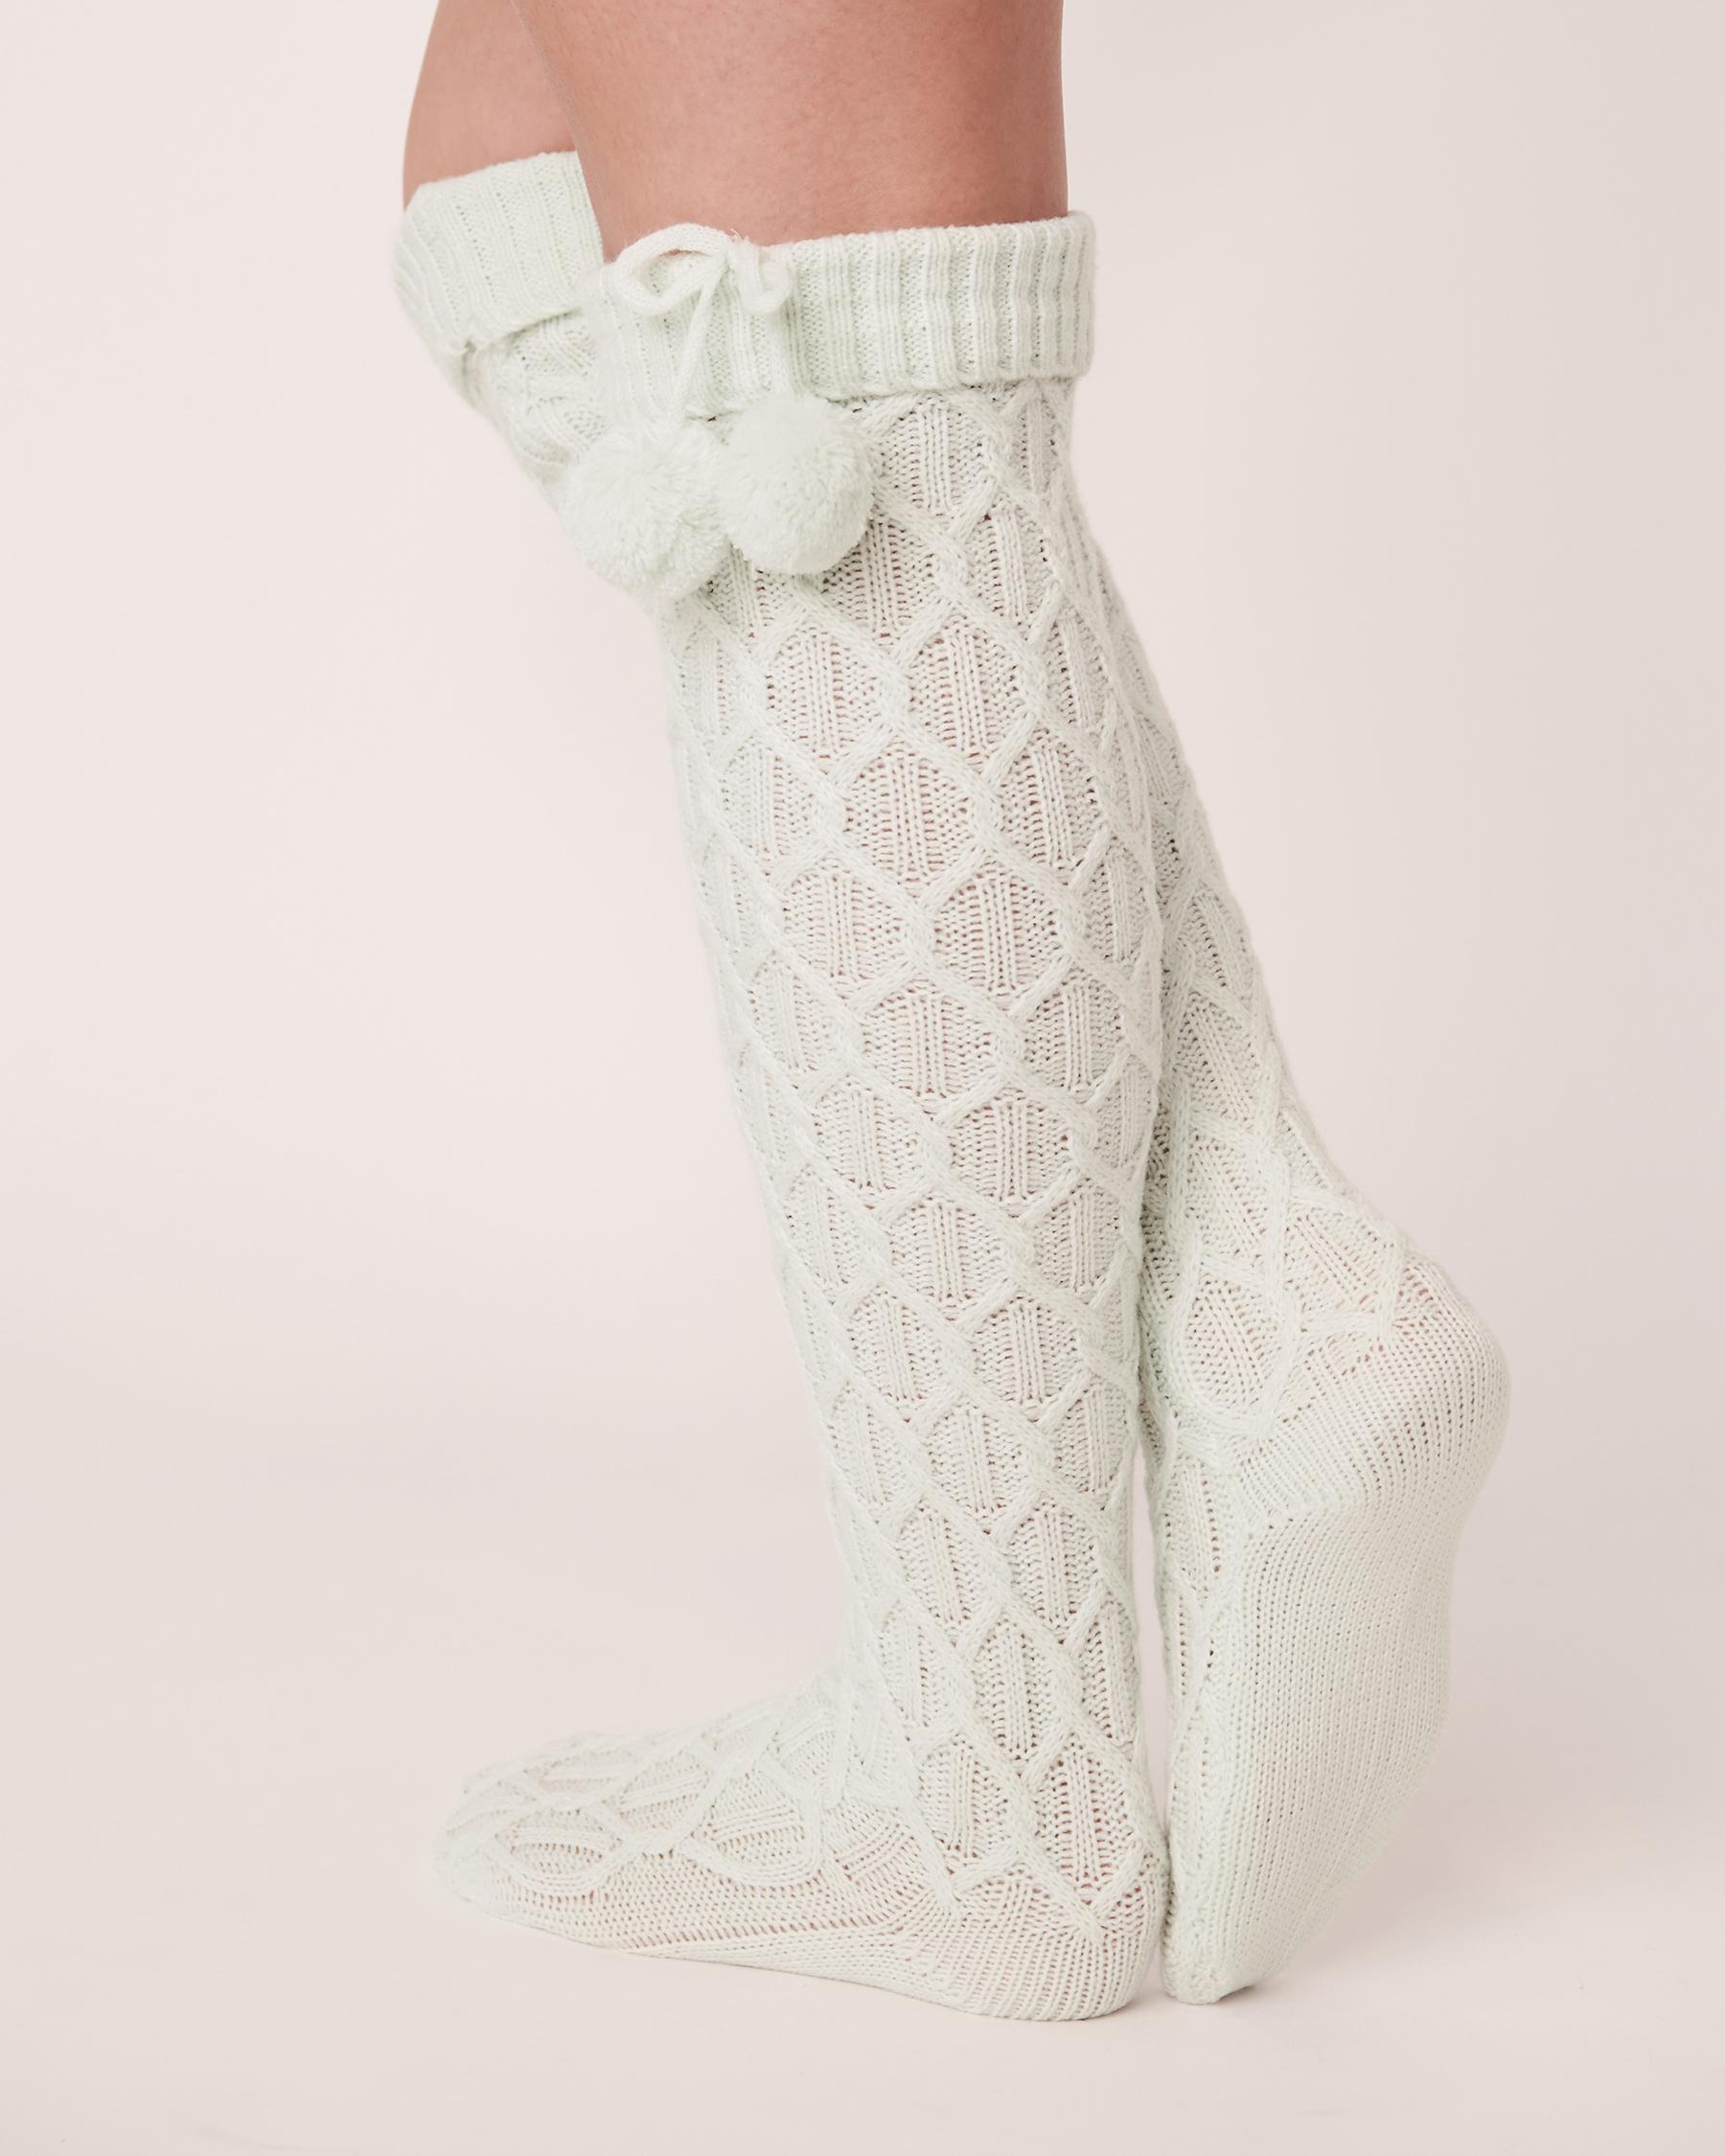 LA VIE EN ROSE Knitted Knee-high Socks Light aqua 40700079 - View2